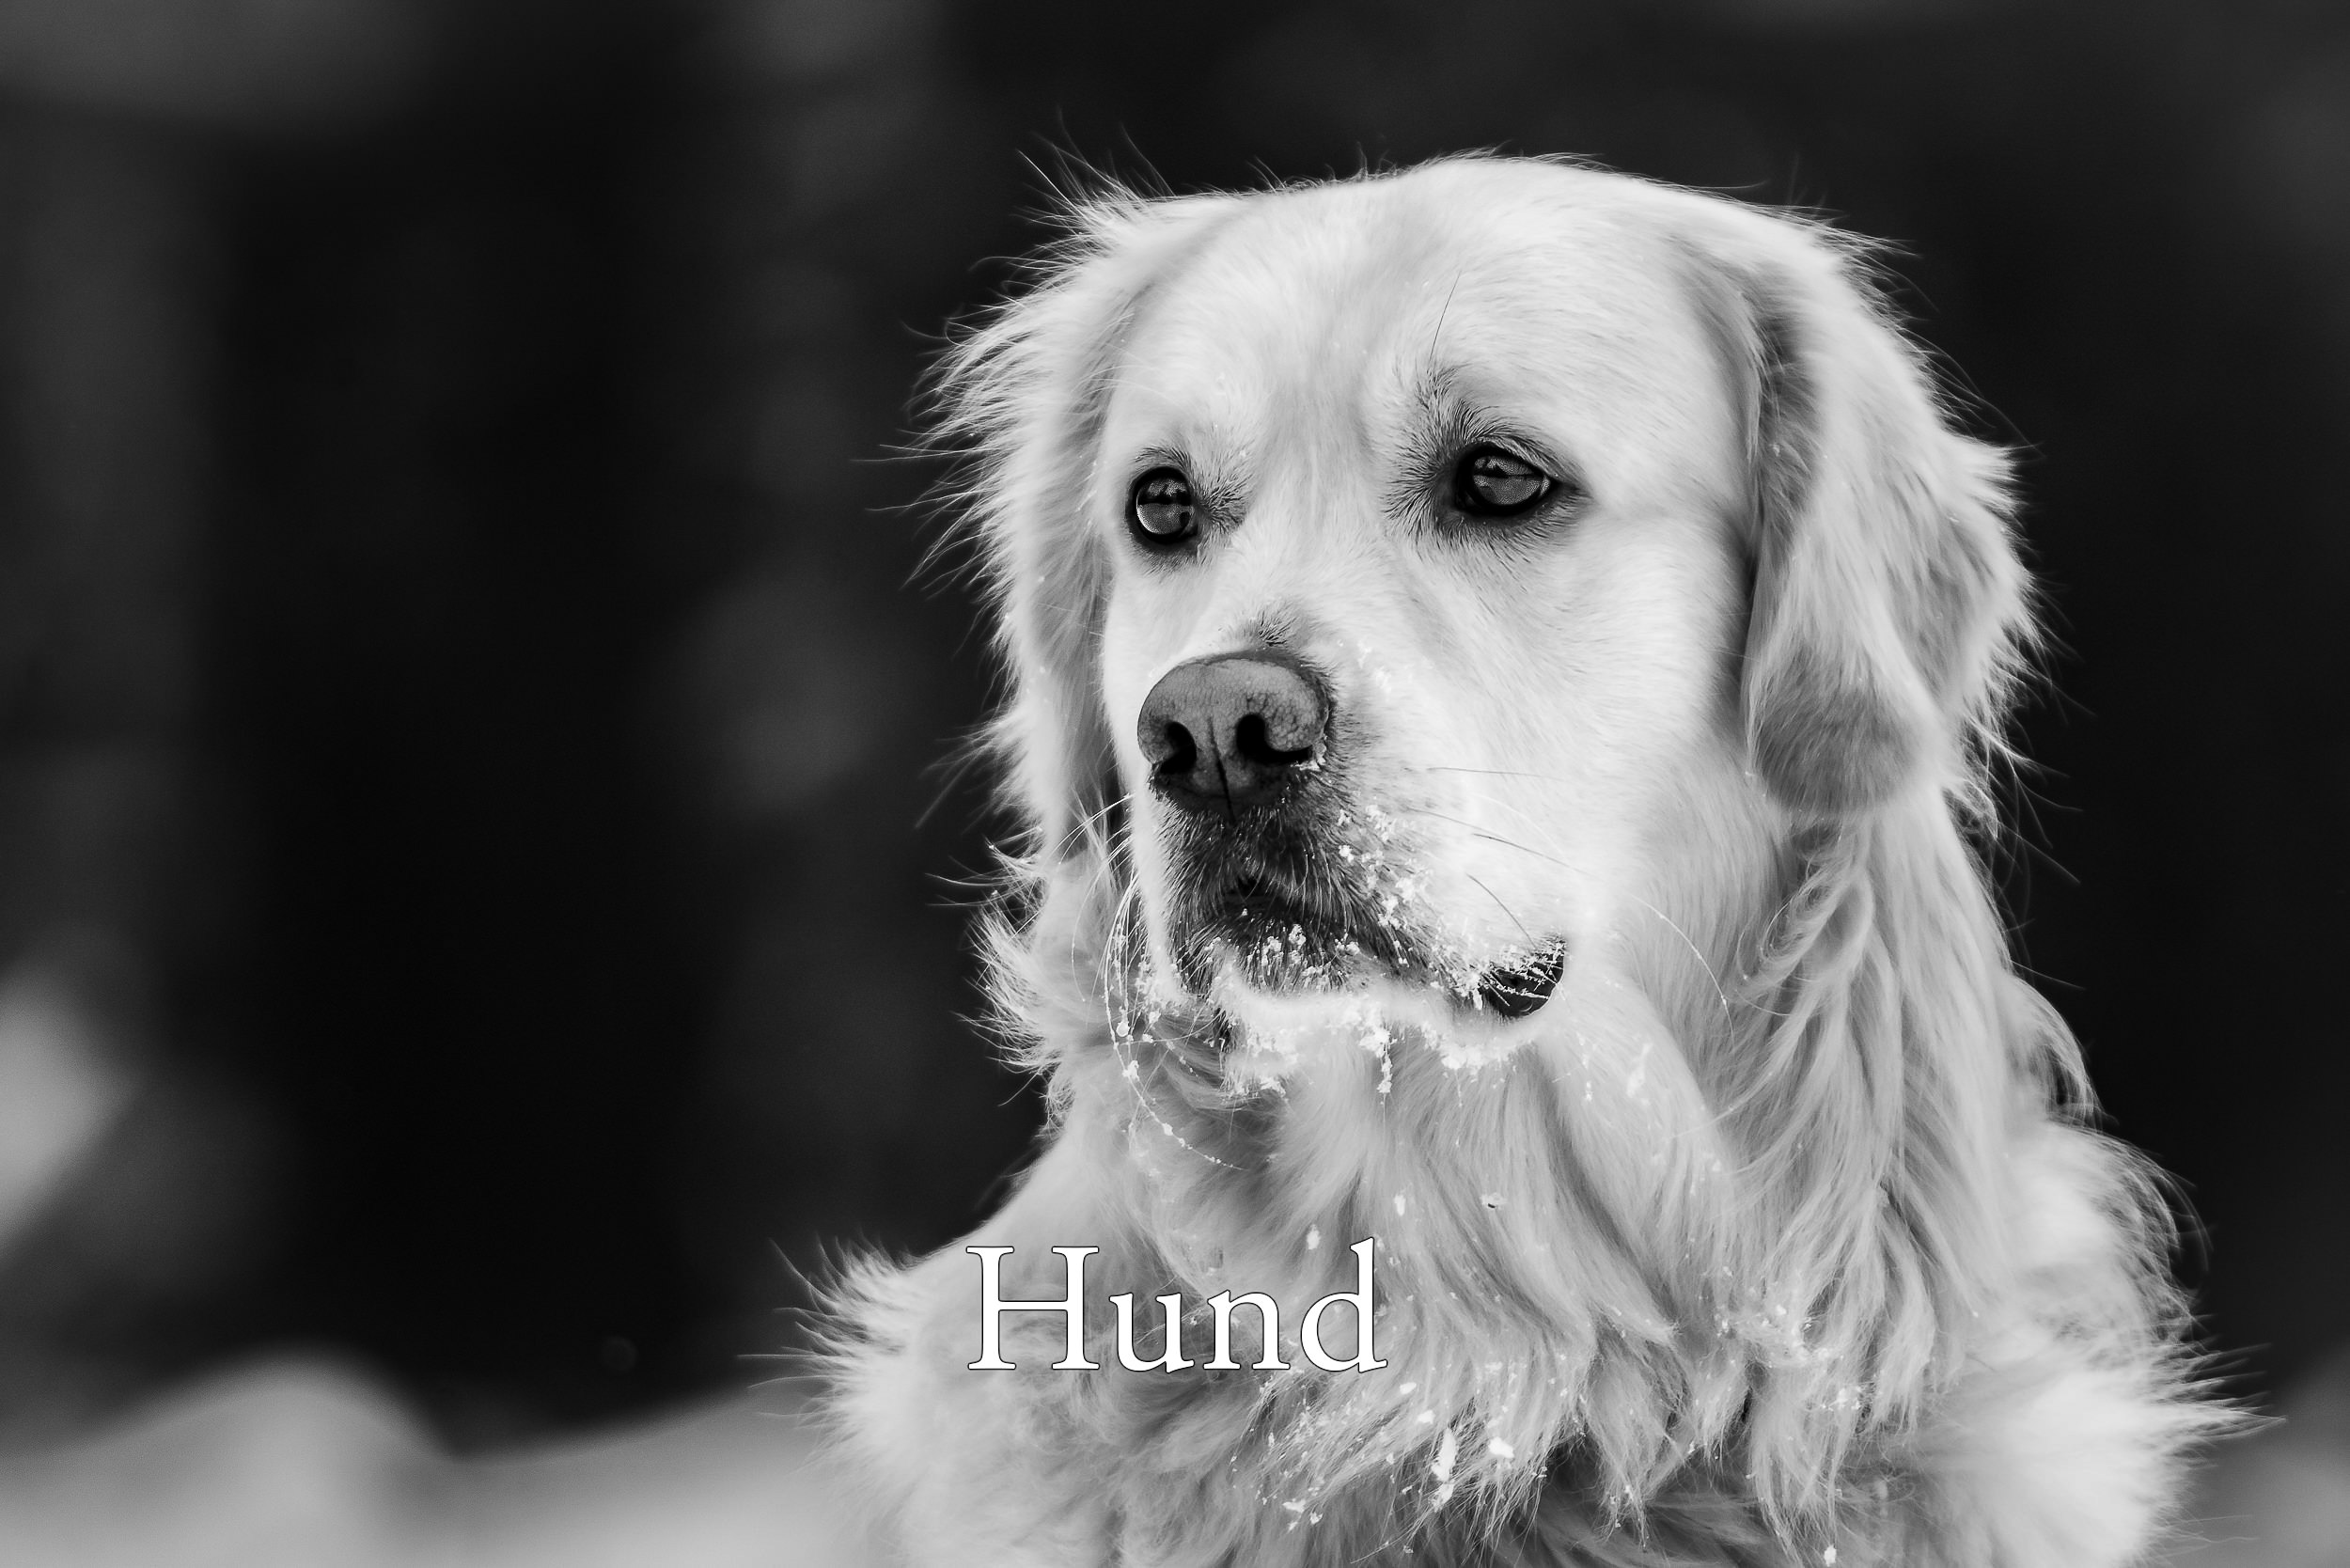 Alvenmod Foto Hundfoto